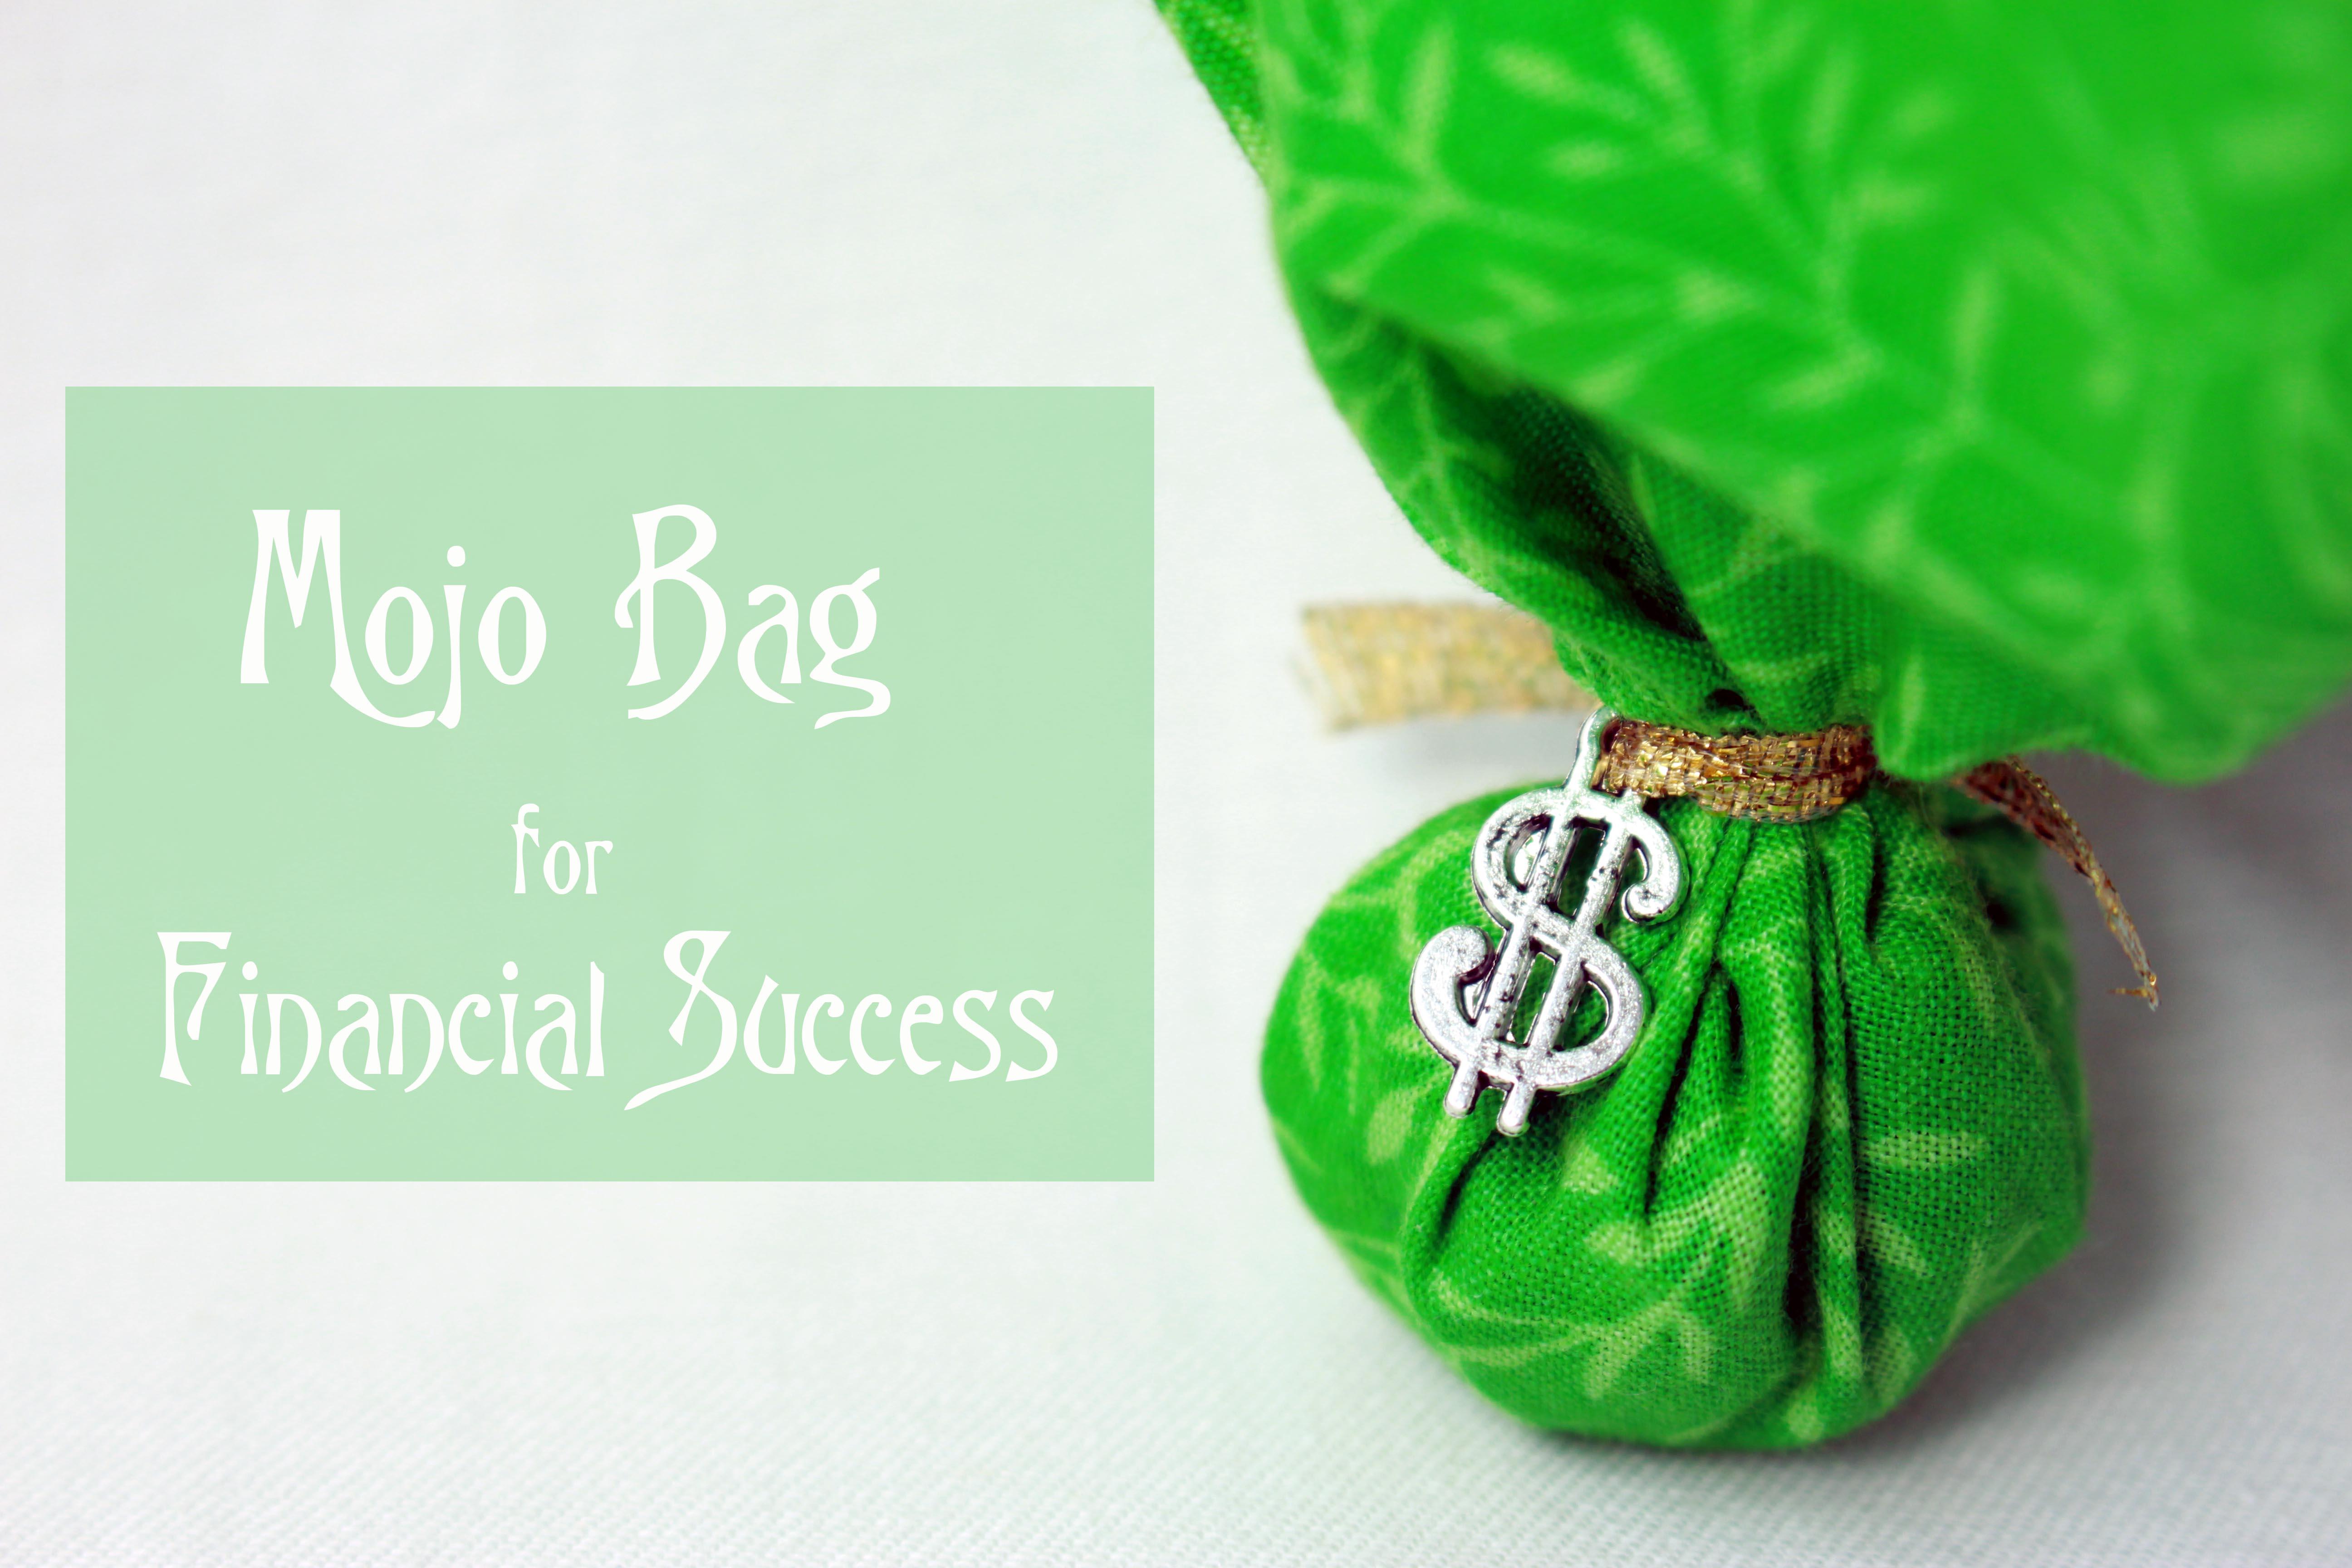 mojo bag for financial success